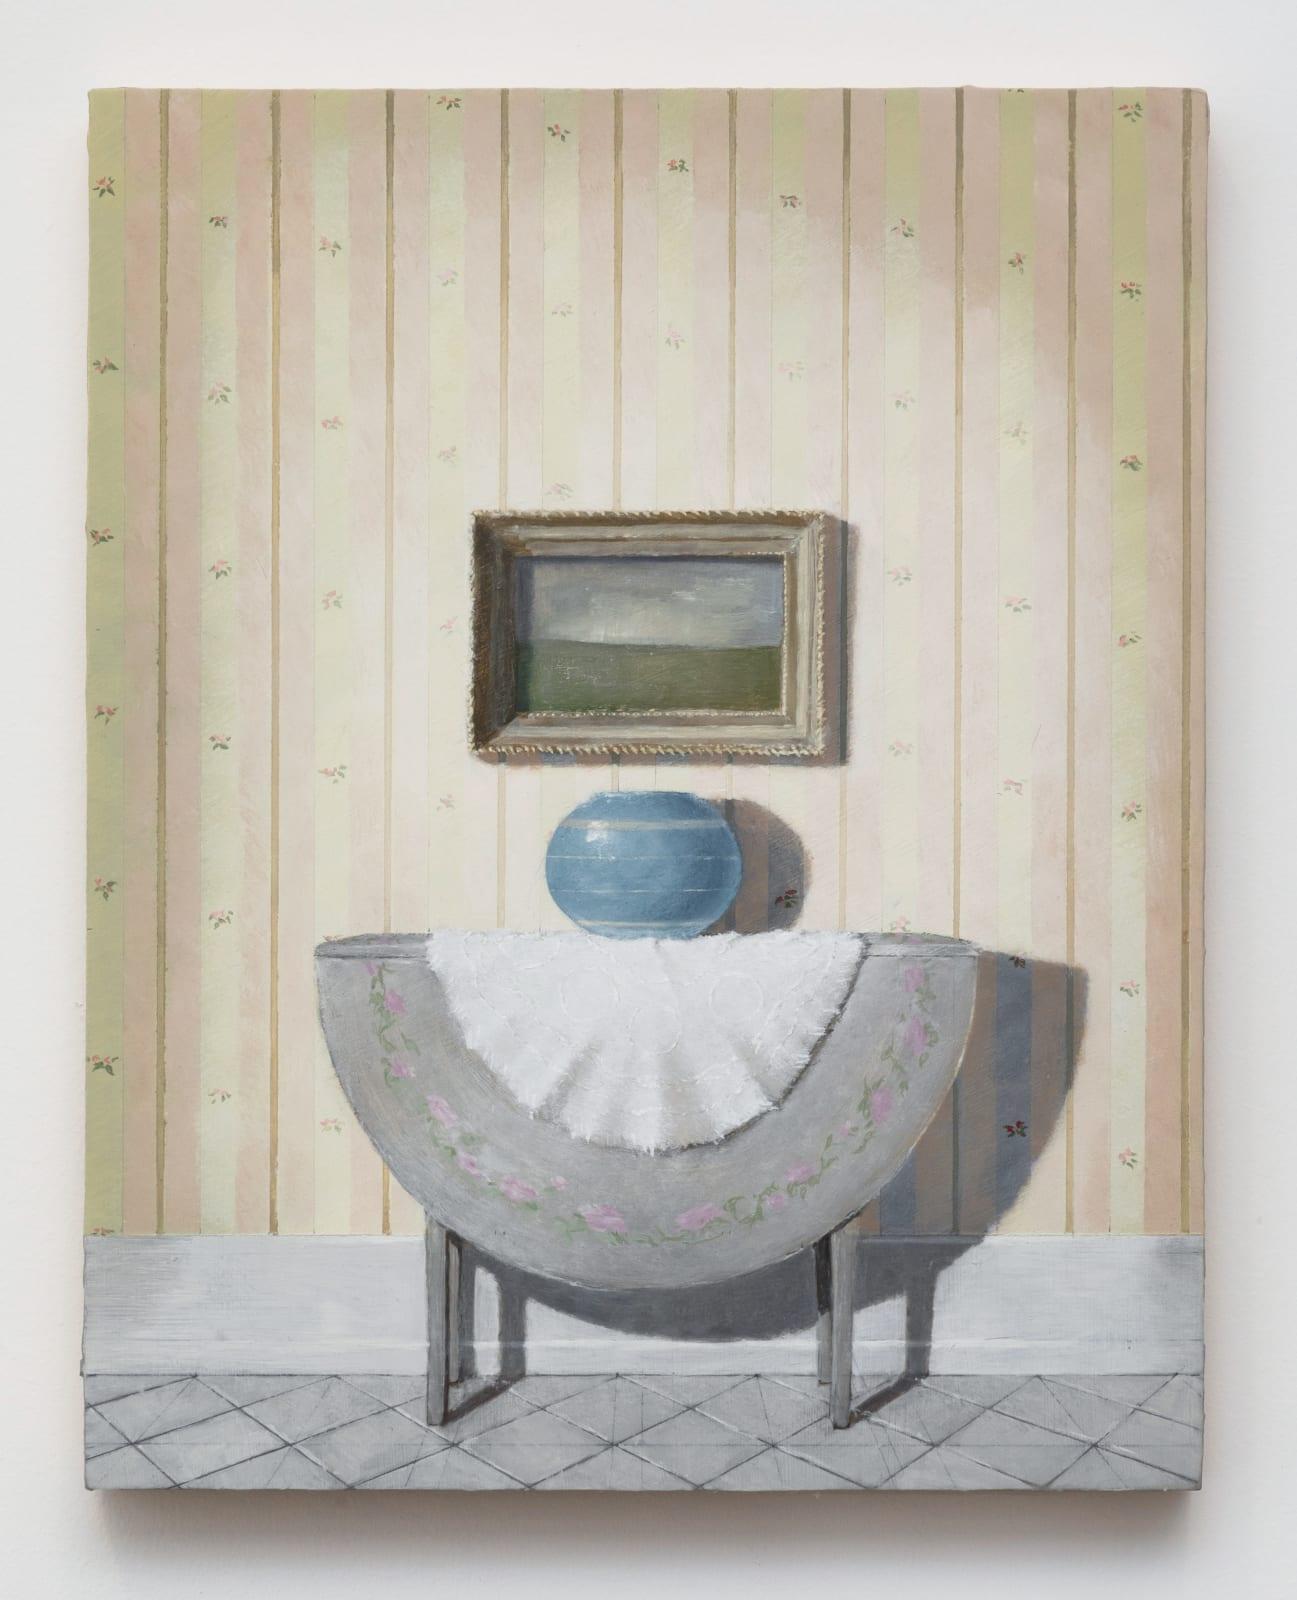 Quentin James McCaffrey, Landscape with Blue Vase, 2020